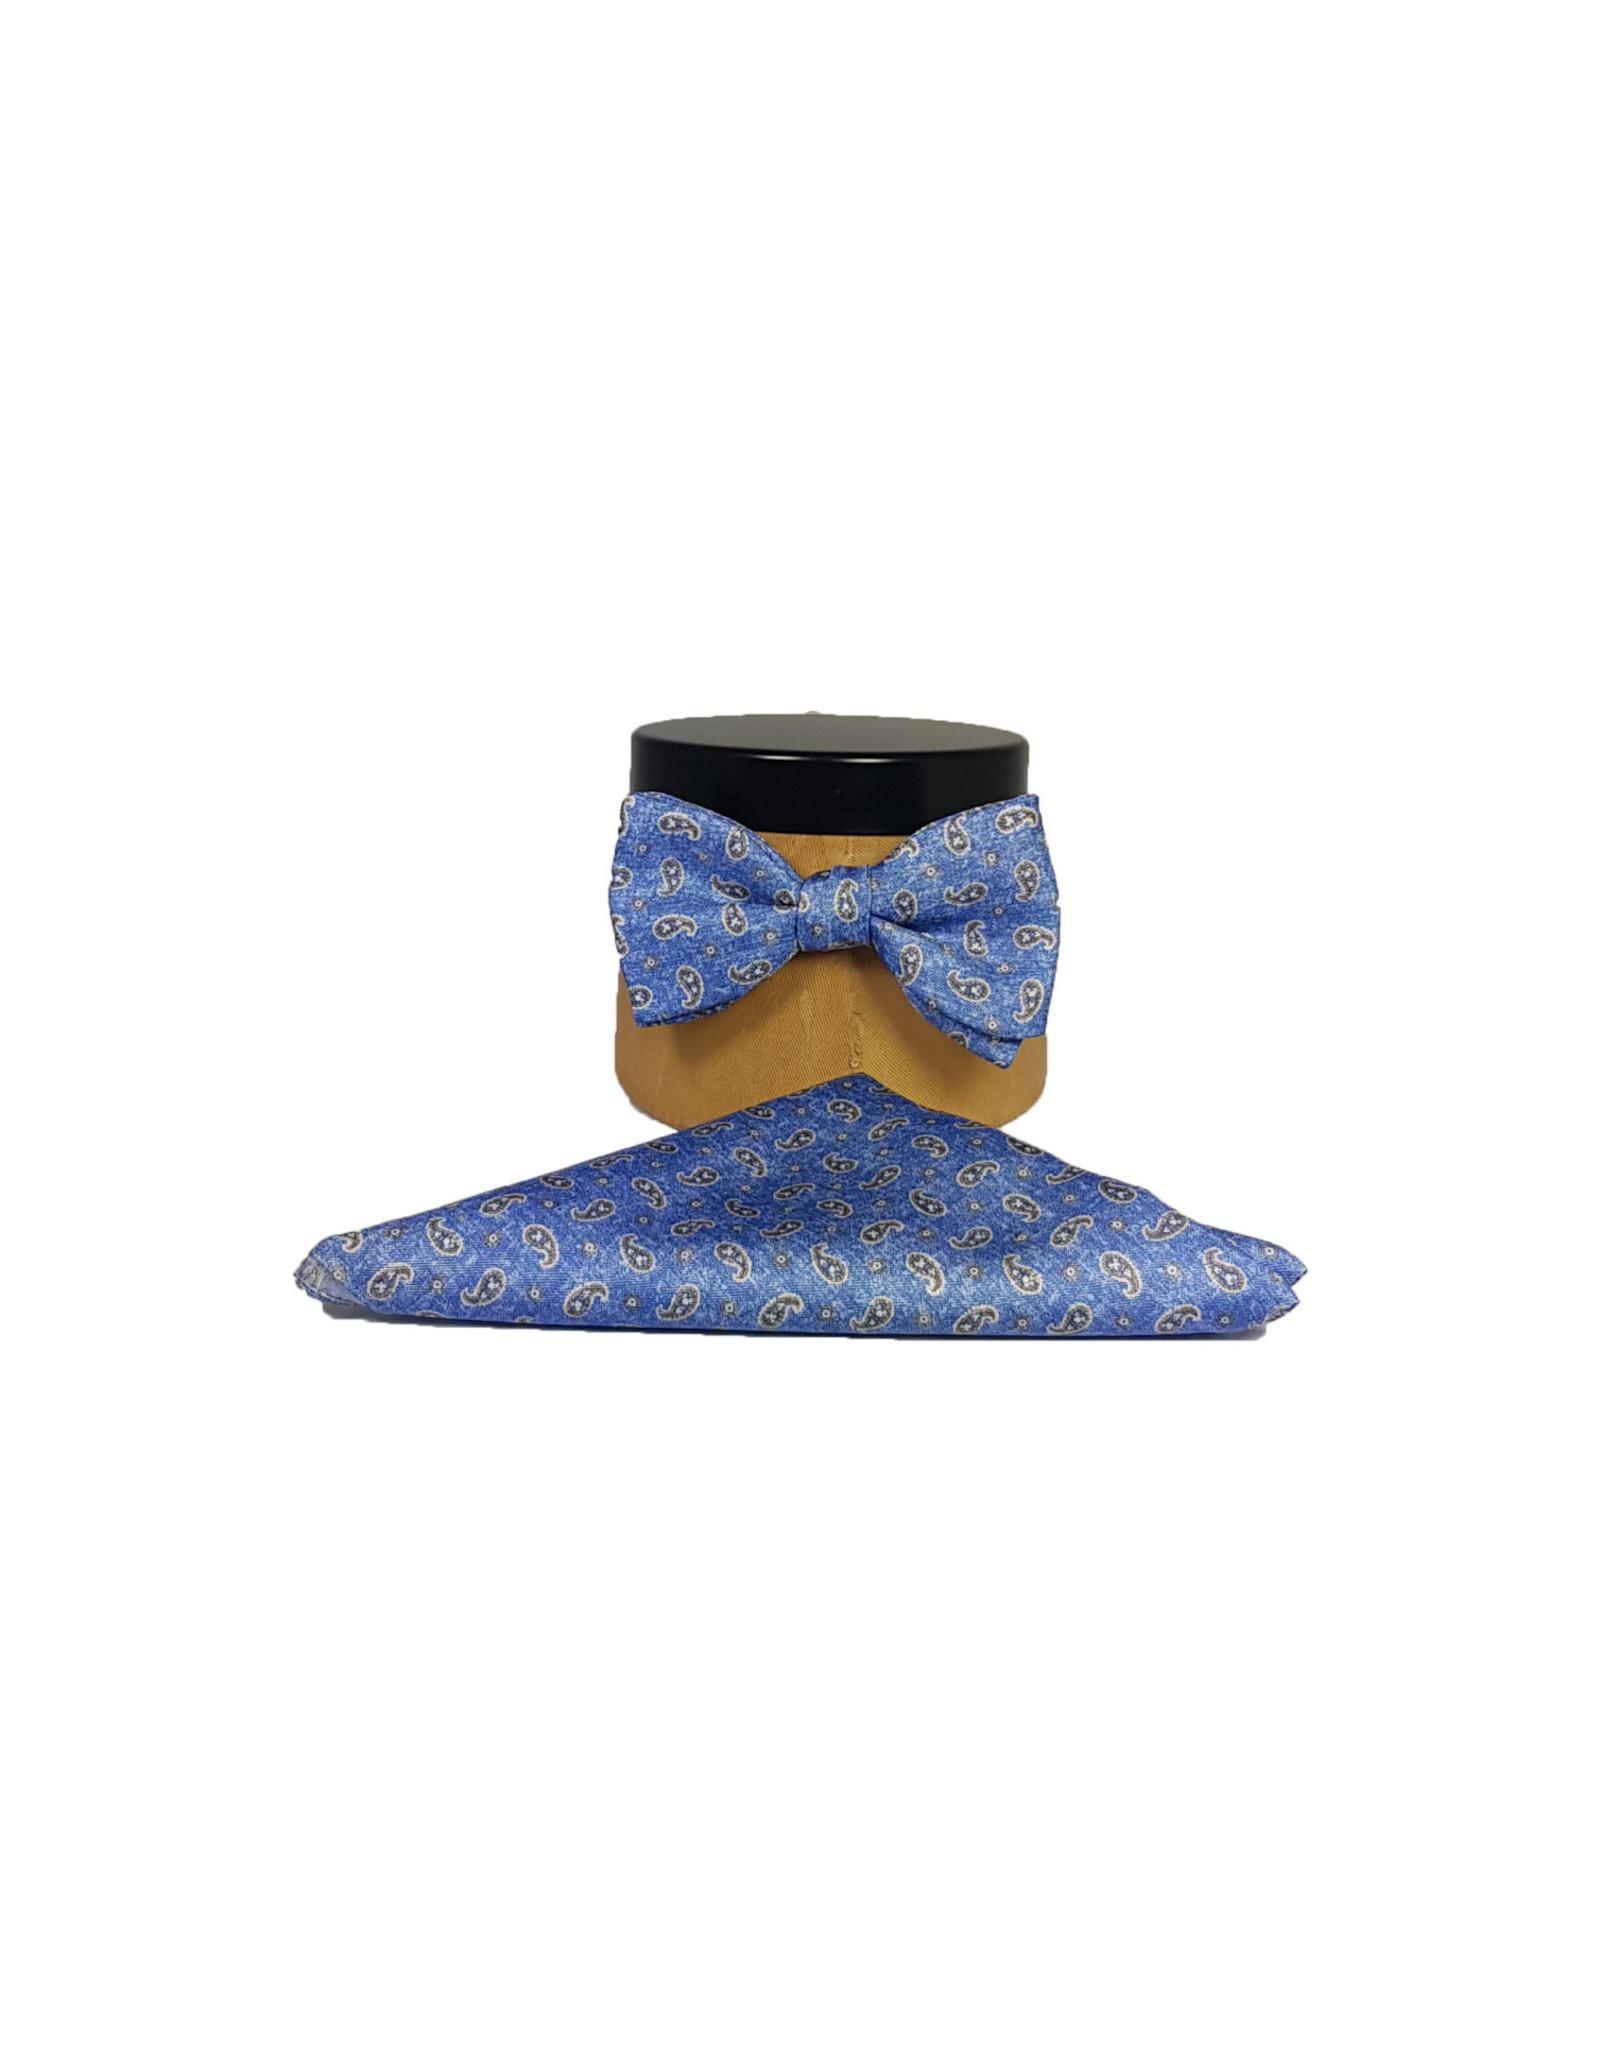 Ascot Sandmore's strik lichtblauw paisley 791/3